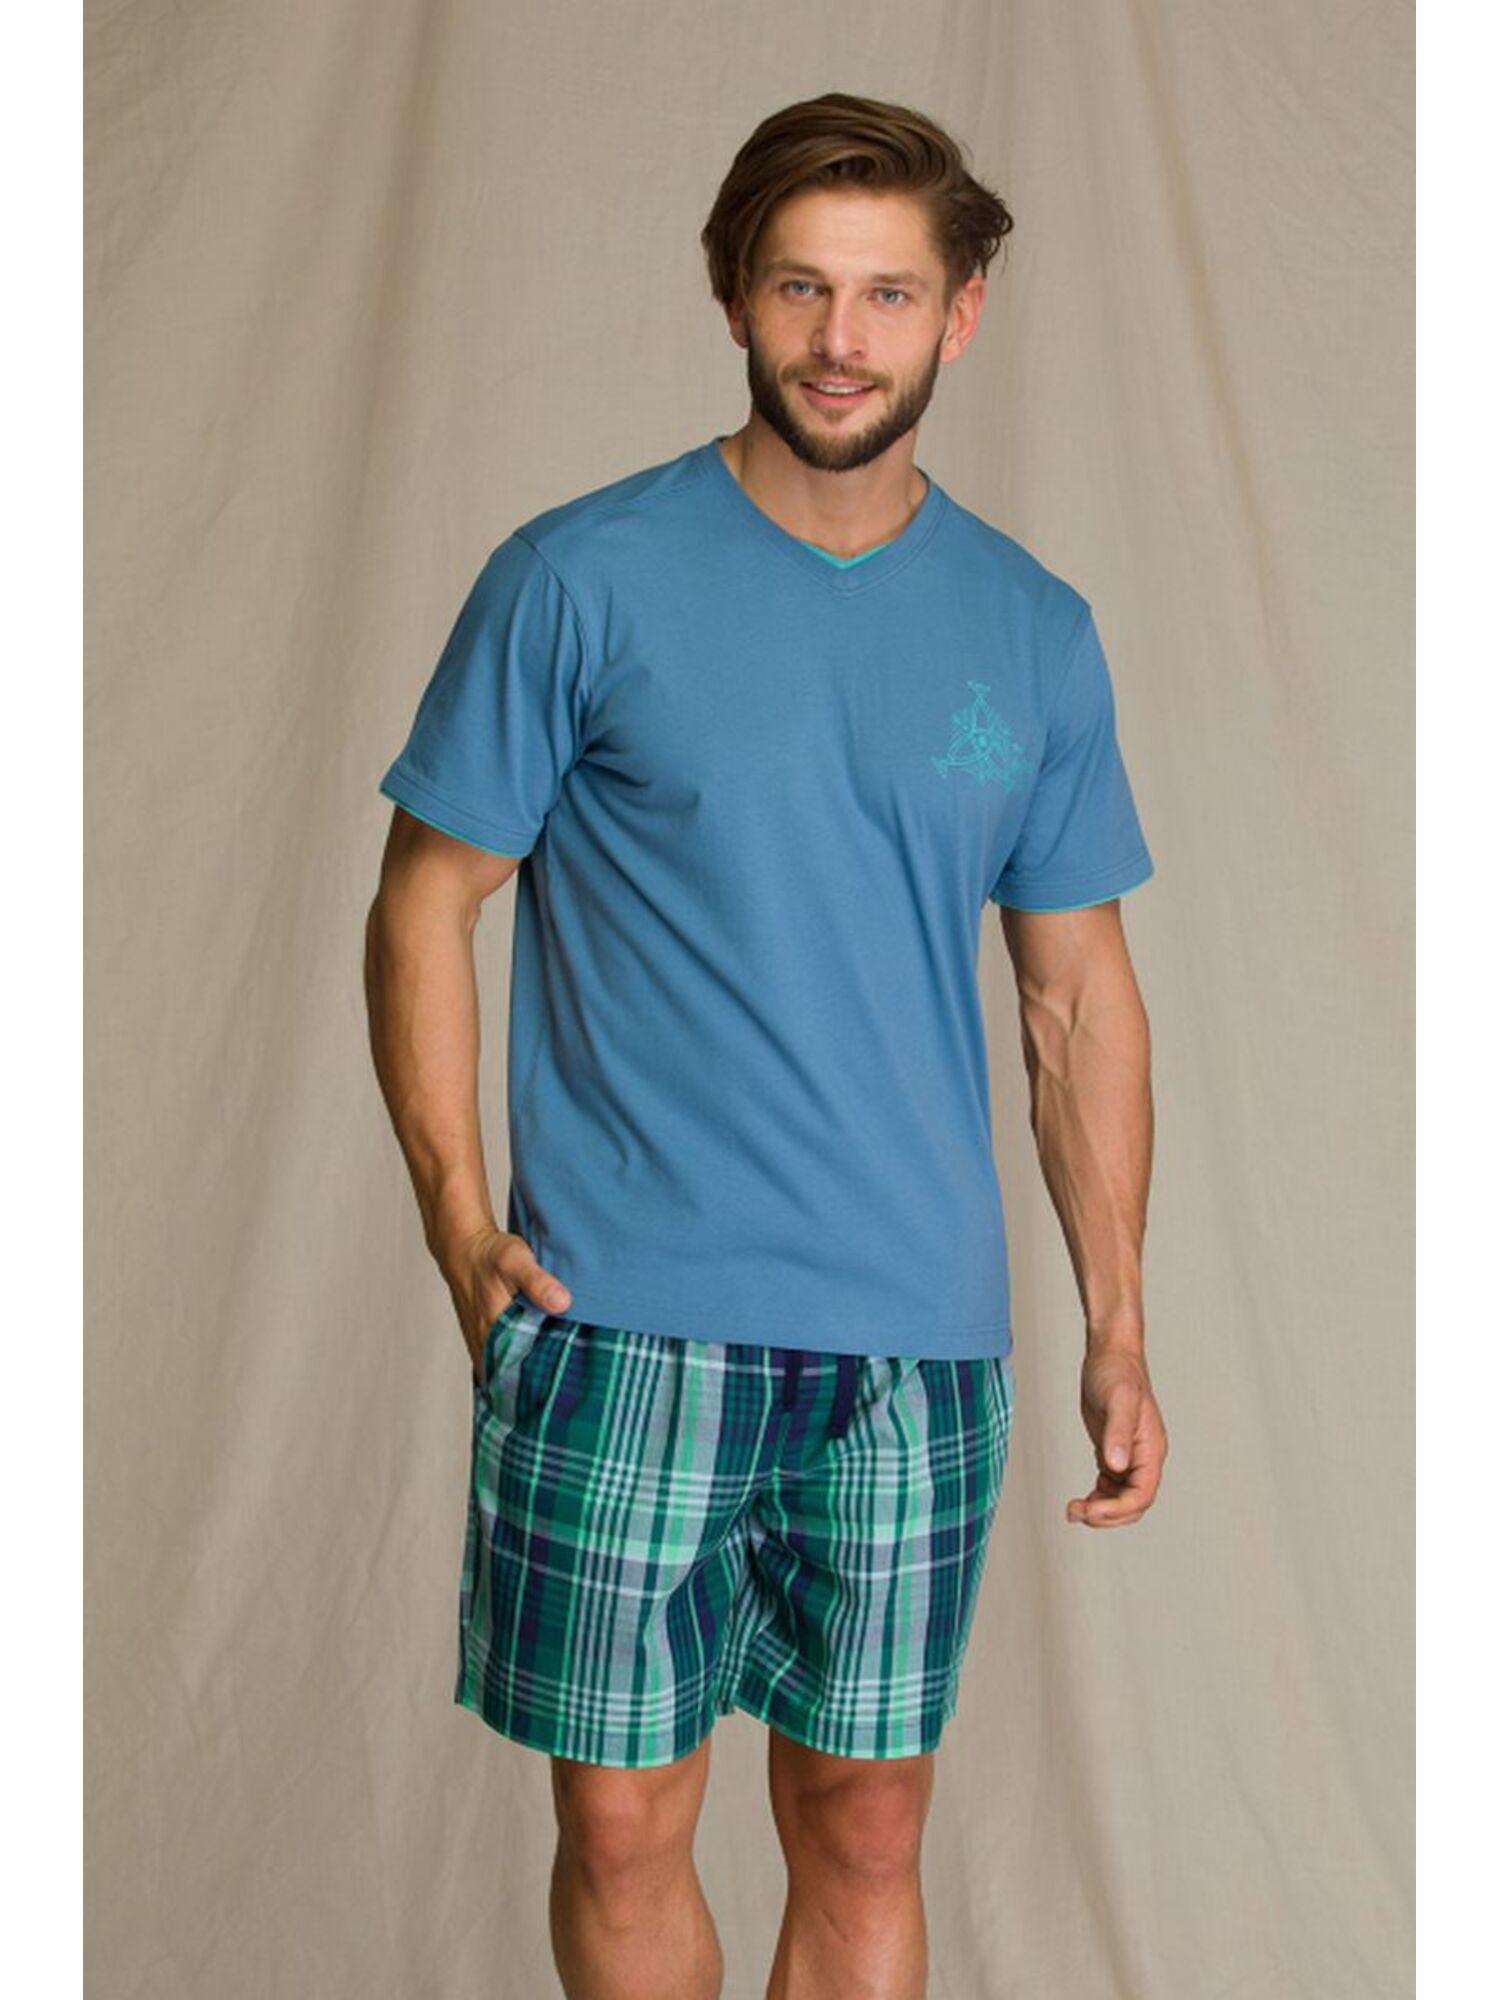 Пижама мужская с шортами KEY 714 A21, синий, KEY